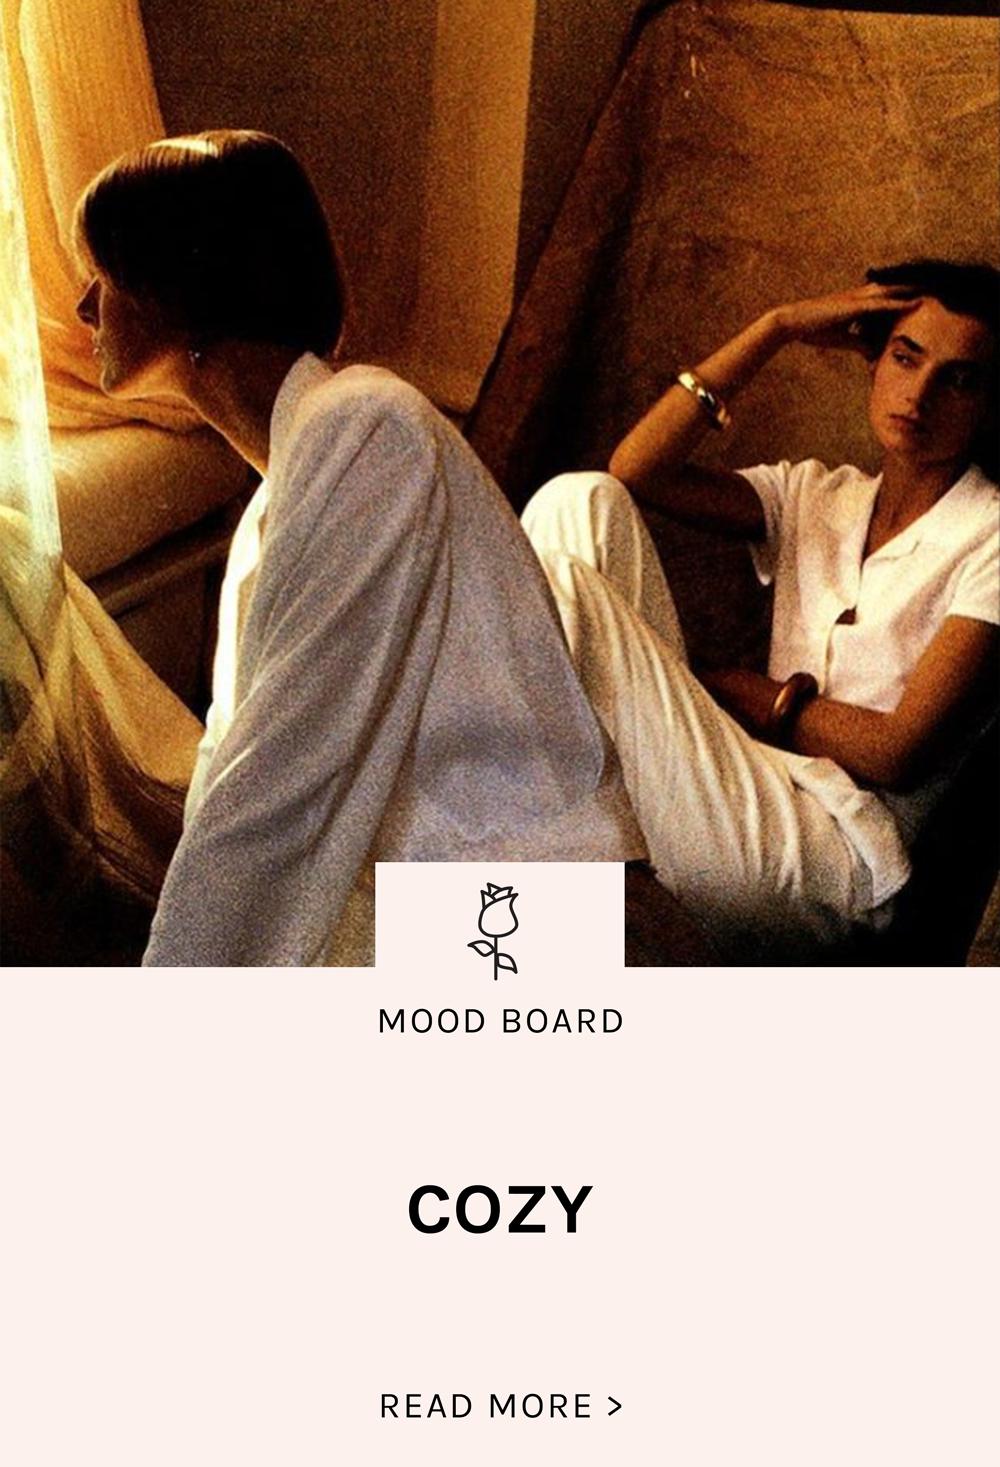 MoodBoard-BlogLanding_cozy.png